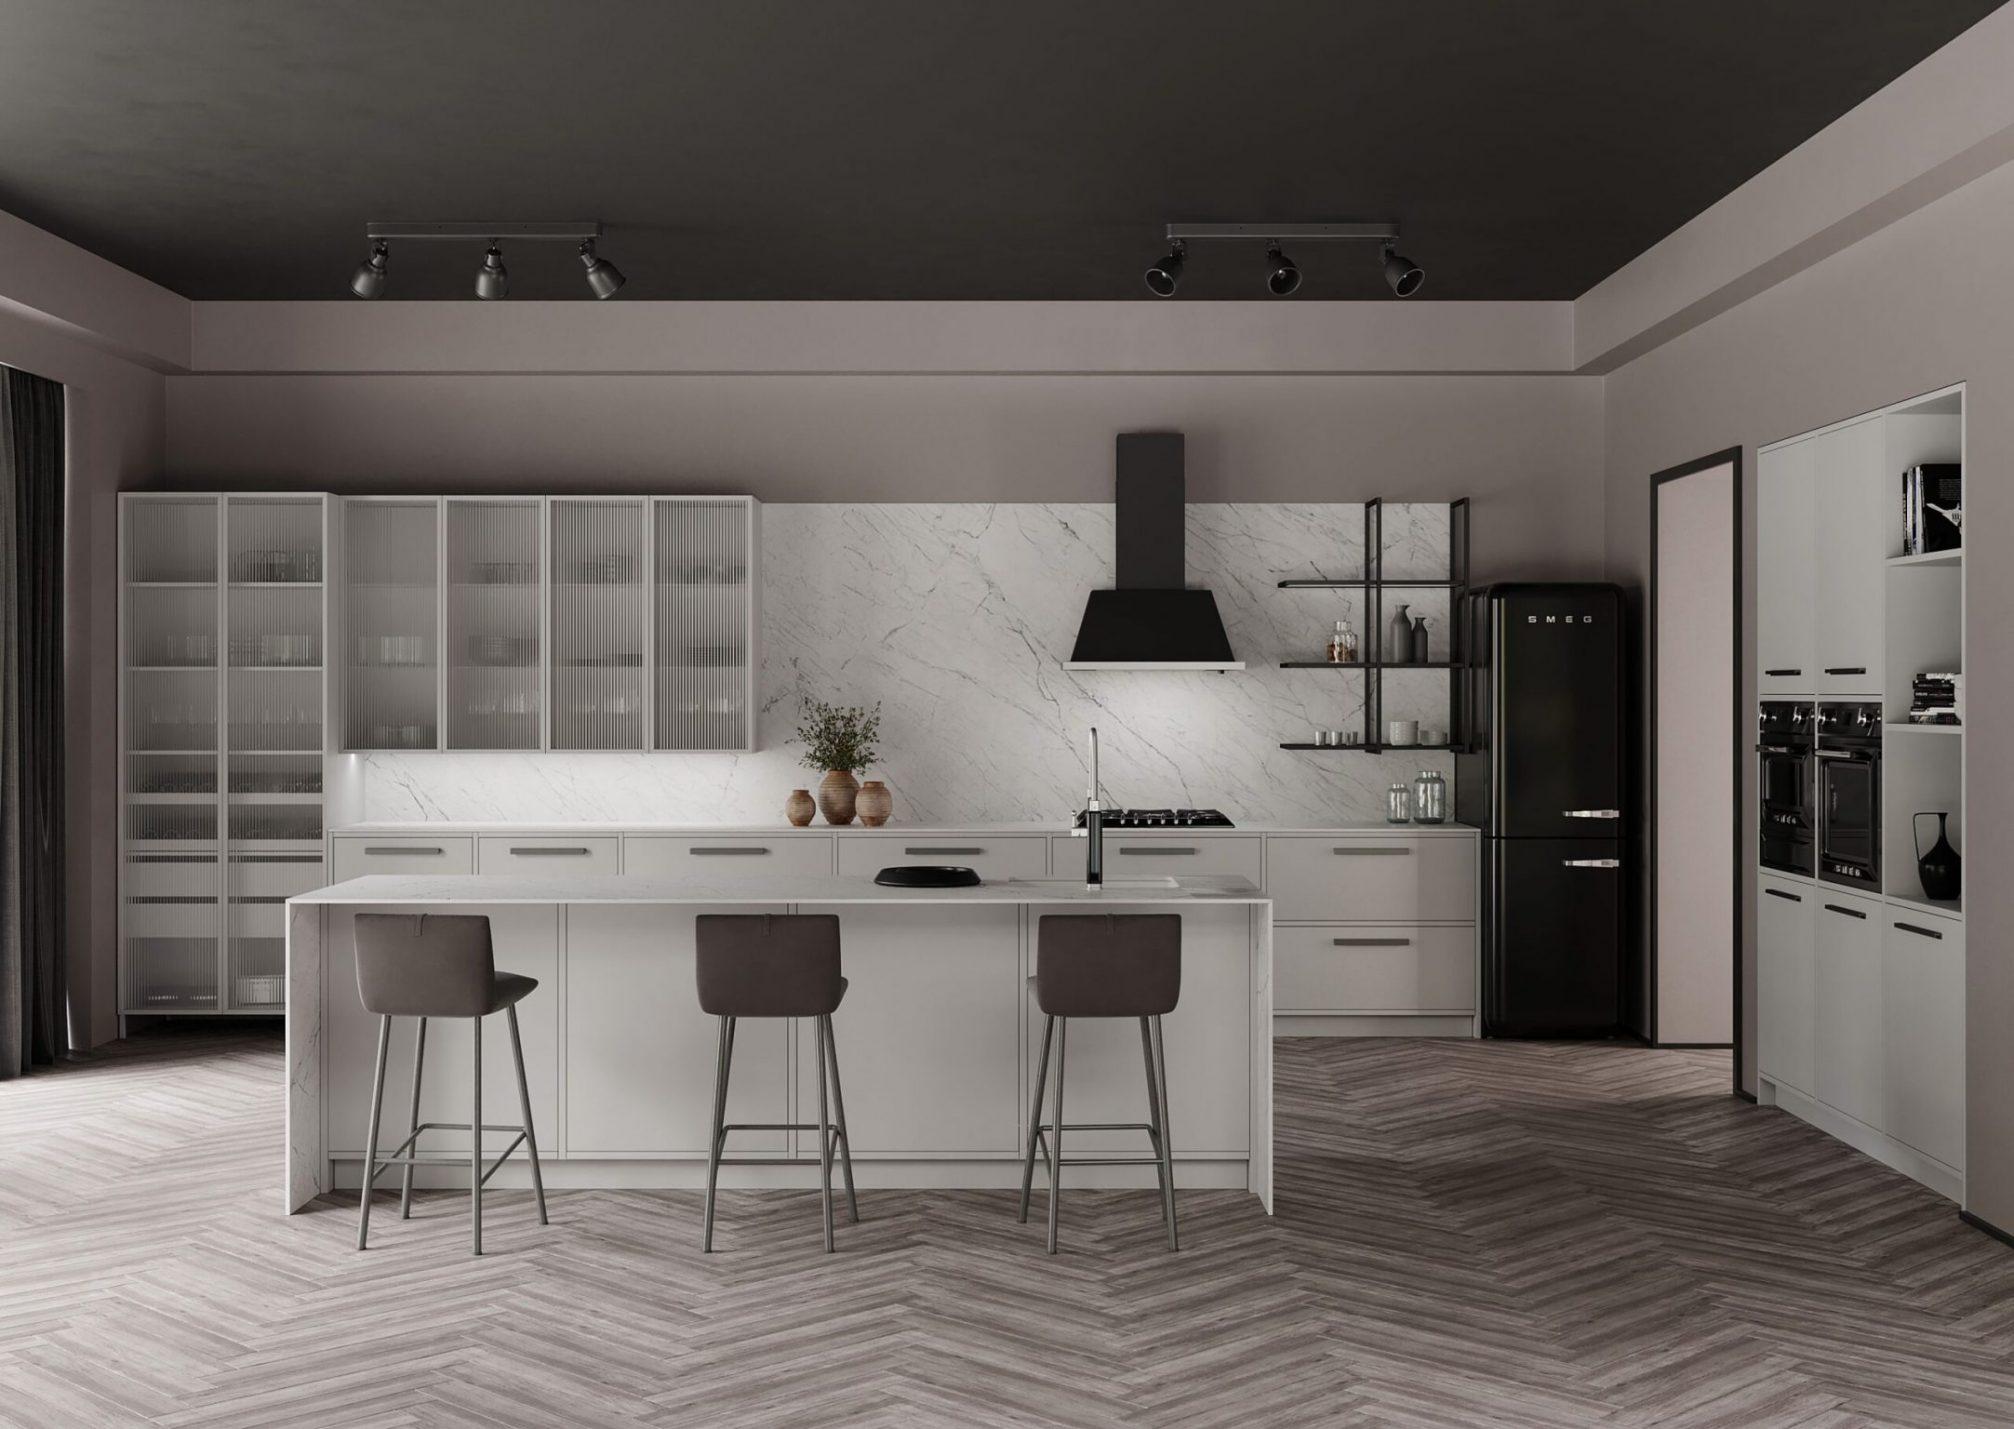 kitchen_studio_hygge_8-scaled